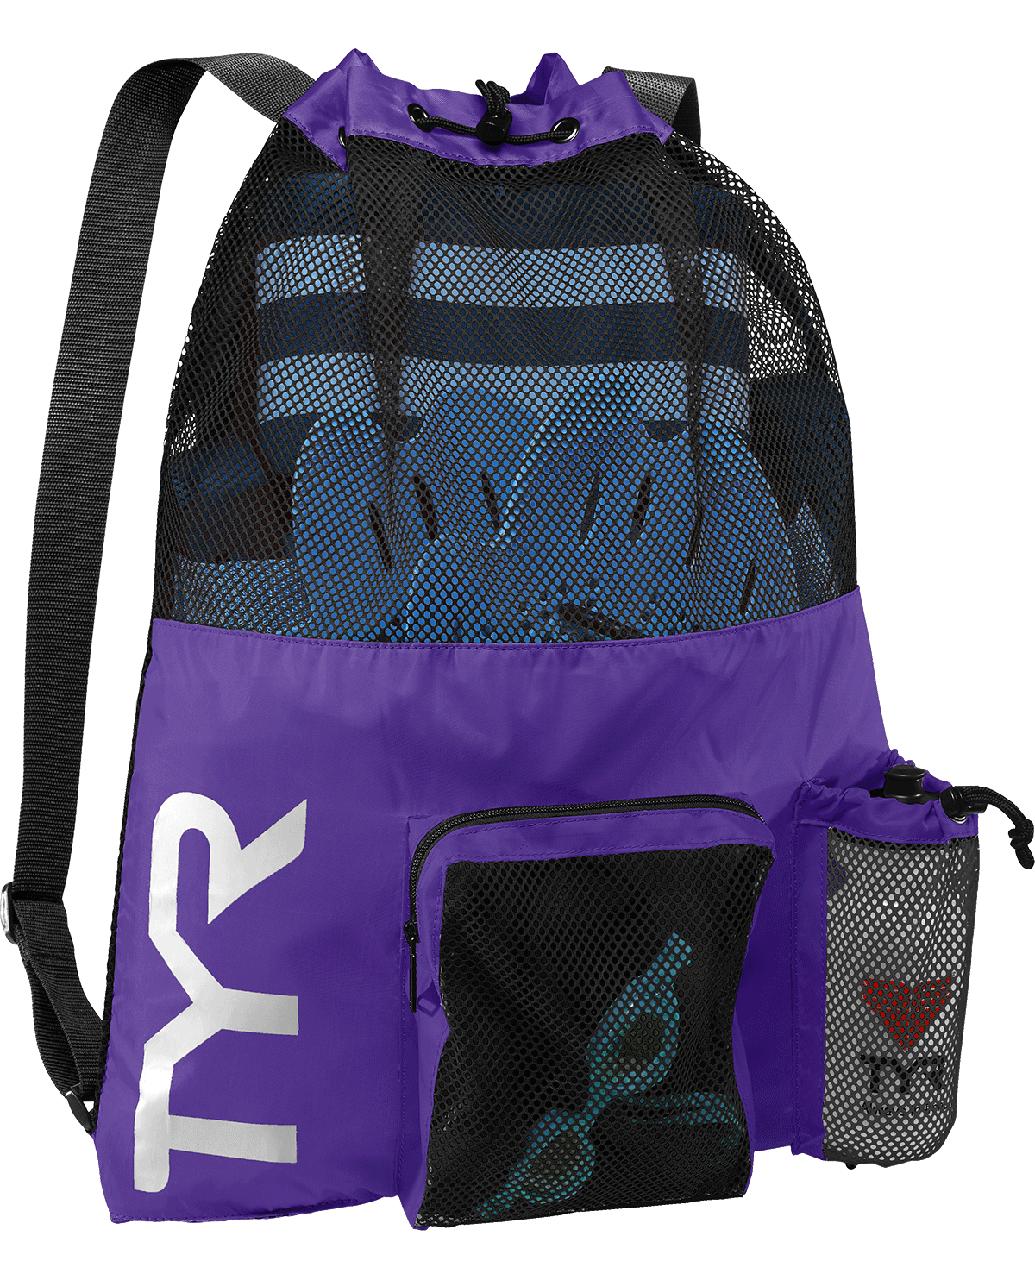 Рюкзак для аксессуаров TYR Big Mesh Mummy Backpack 510